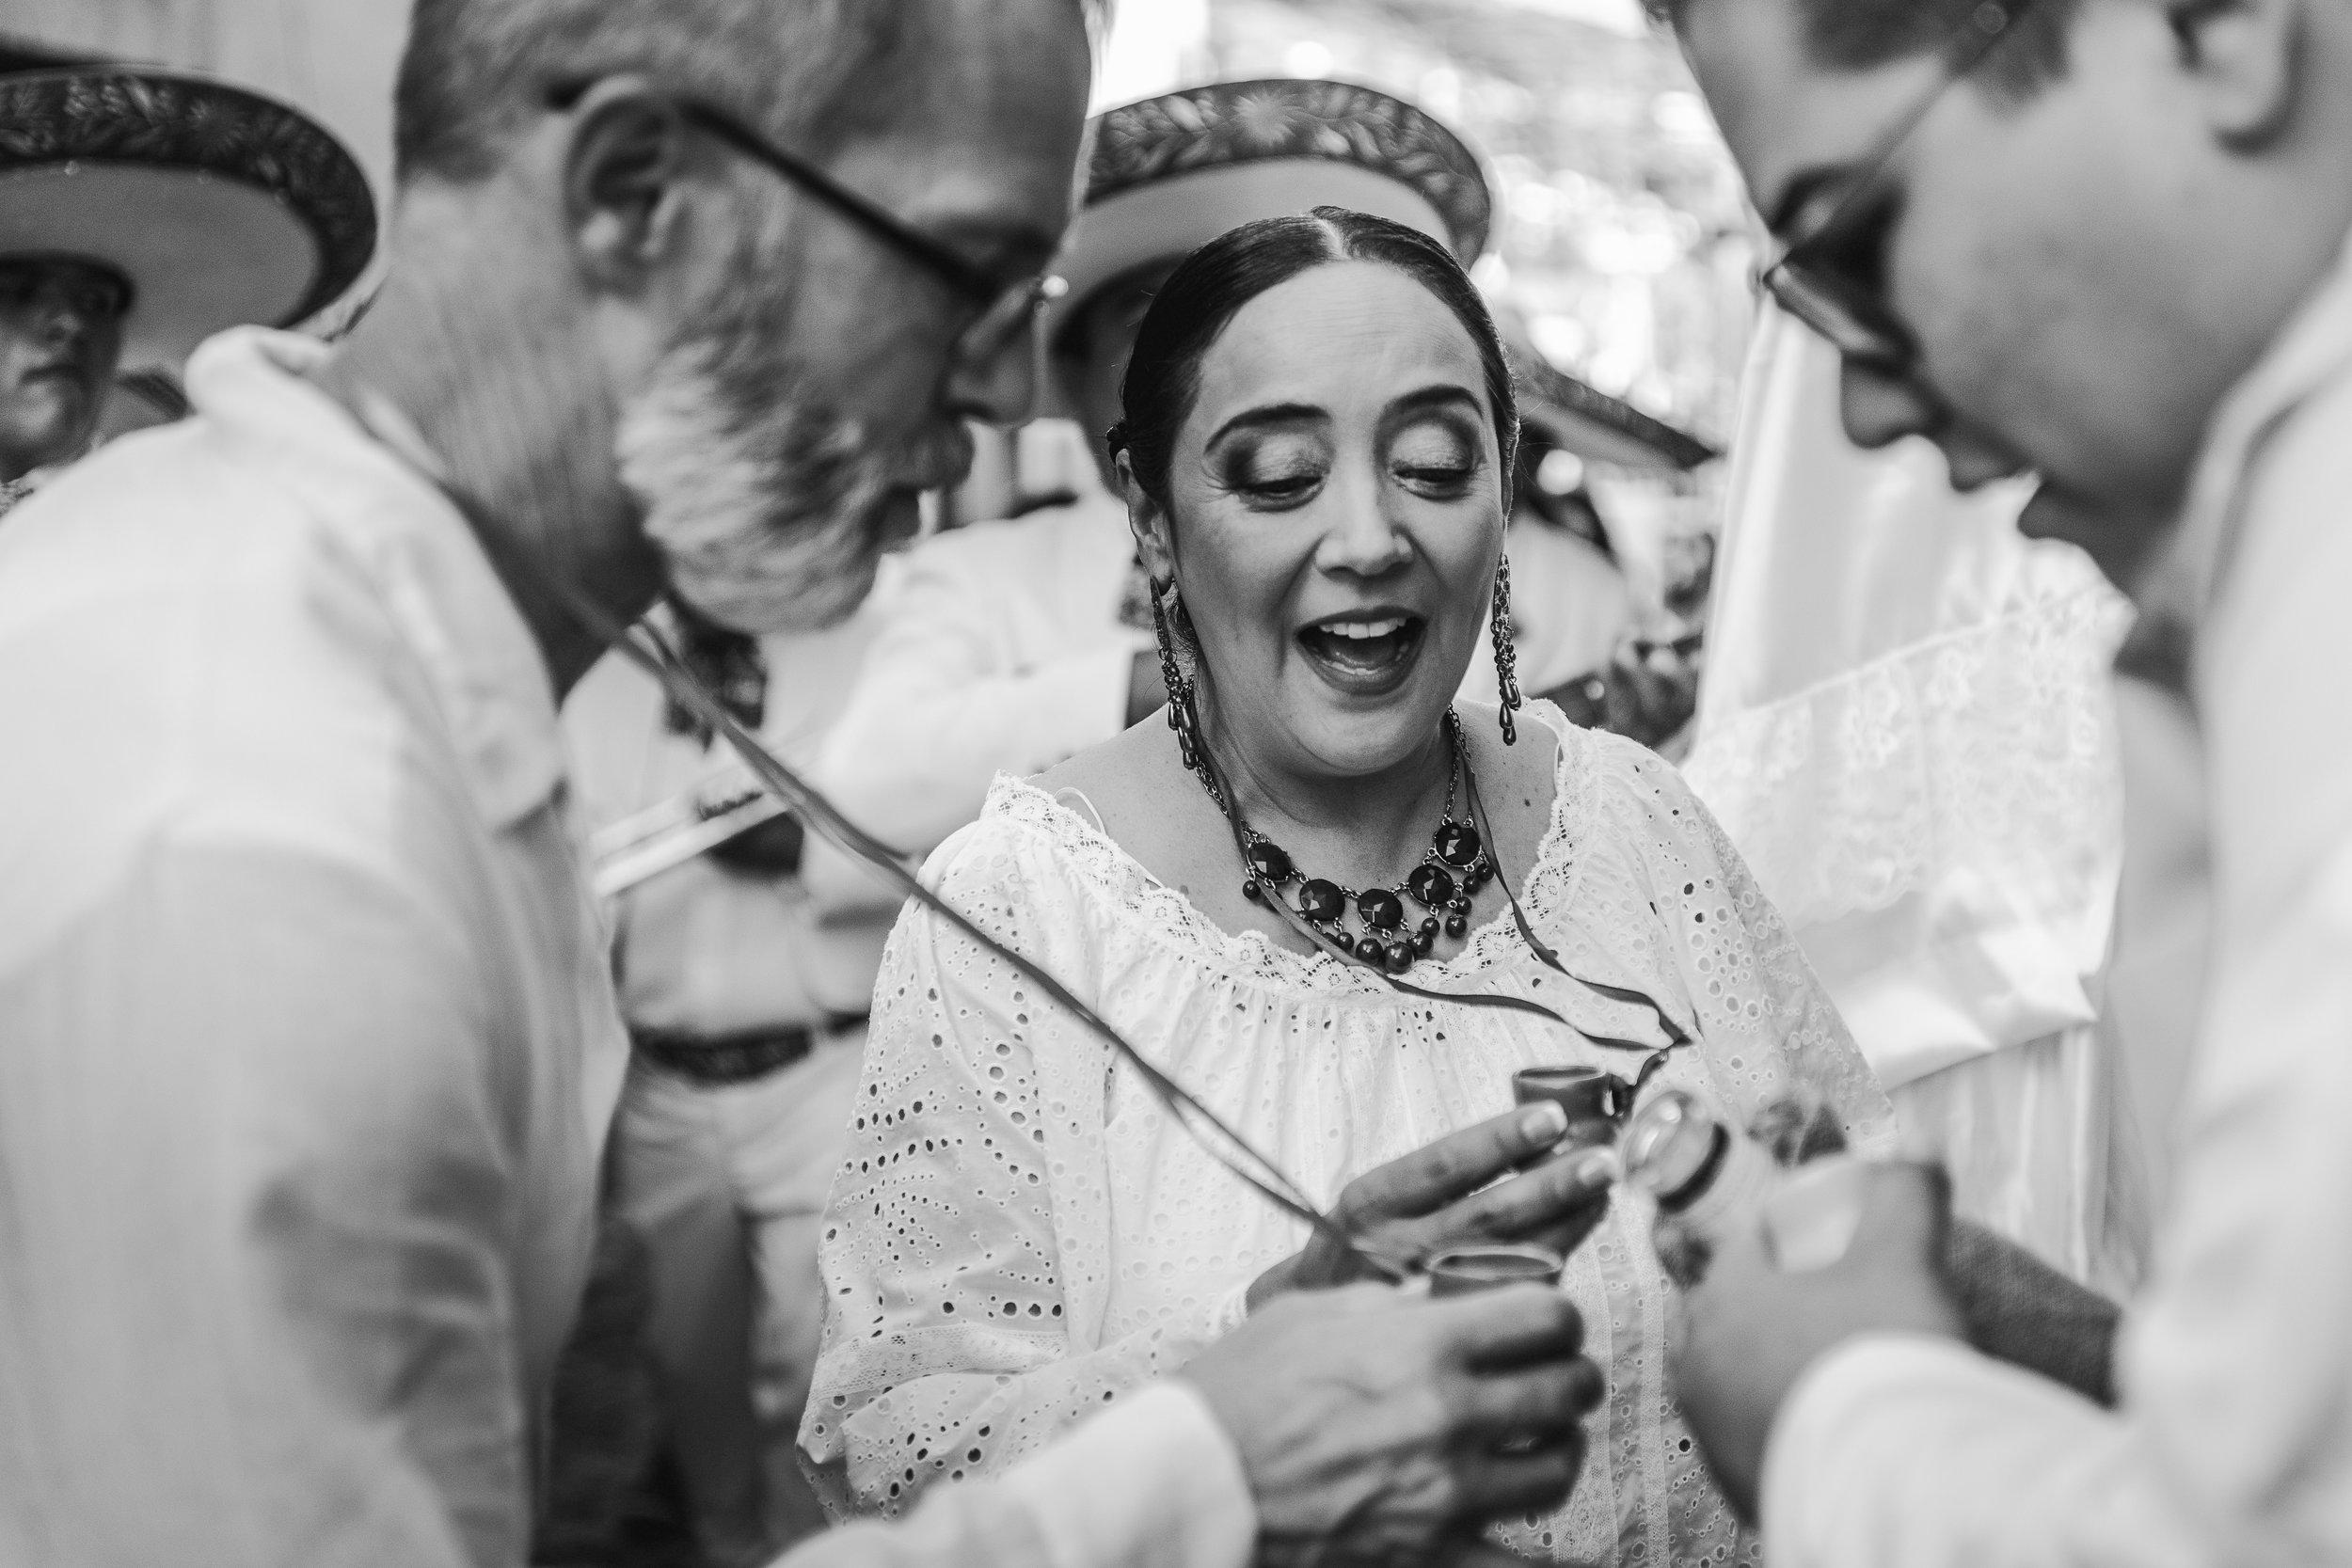 MaurizioSolisBroca-casa-carino-san-miguel-de-allende-wedding-7.jpg